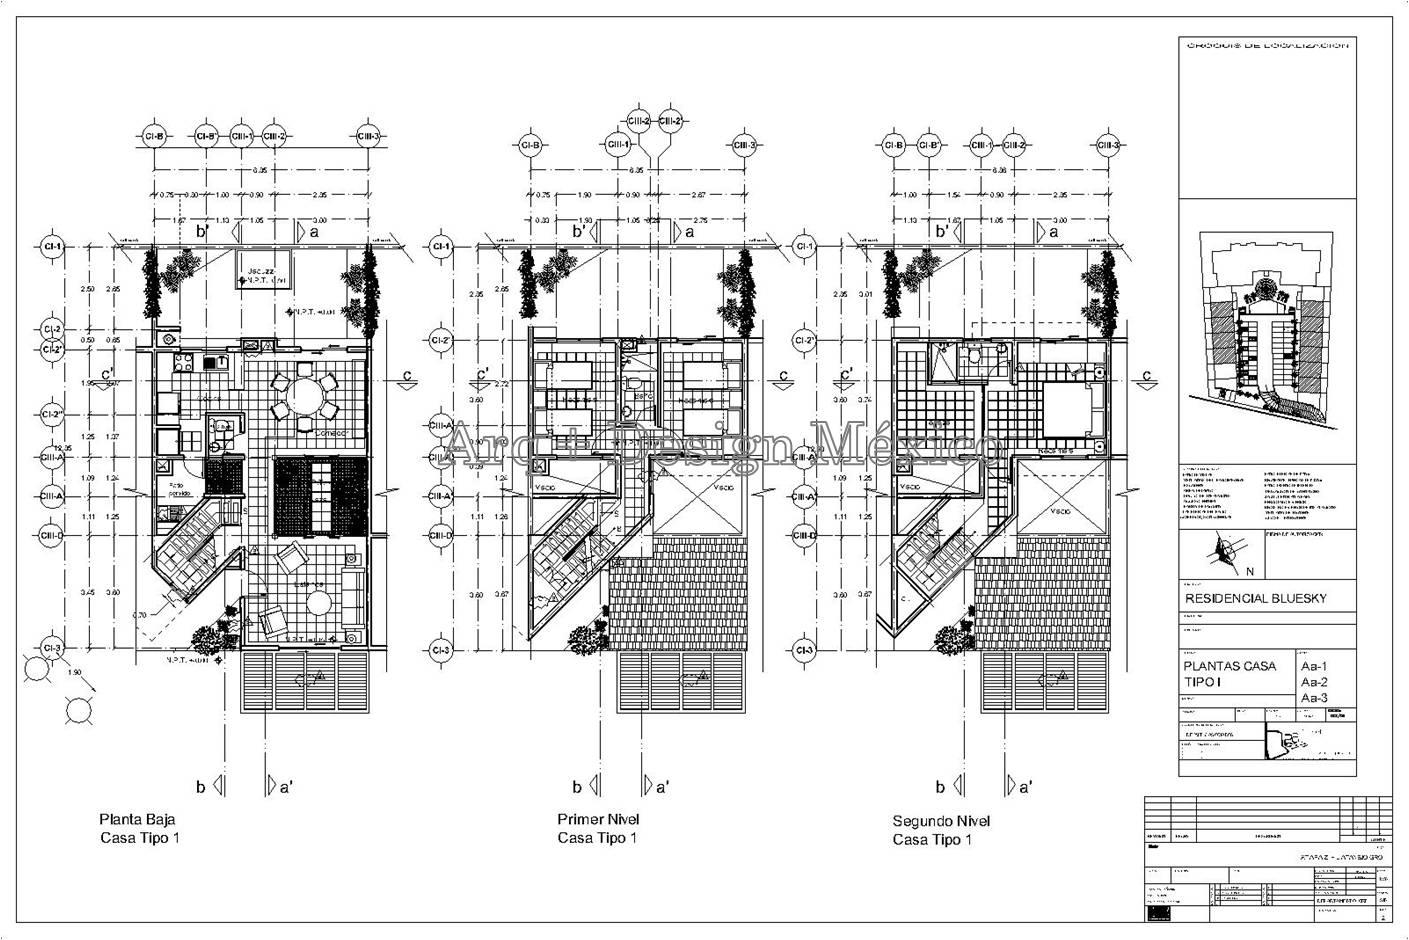 Pin planos arquitectonicos on pinterest for Representacion de planos arquitectonicos